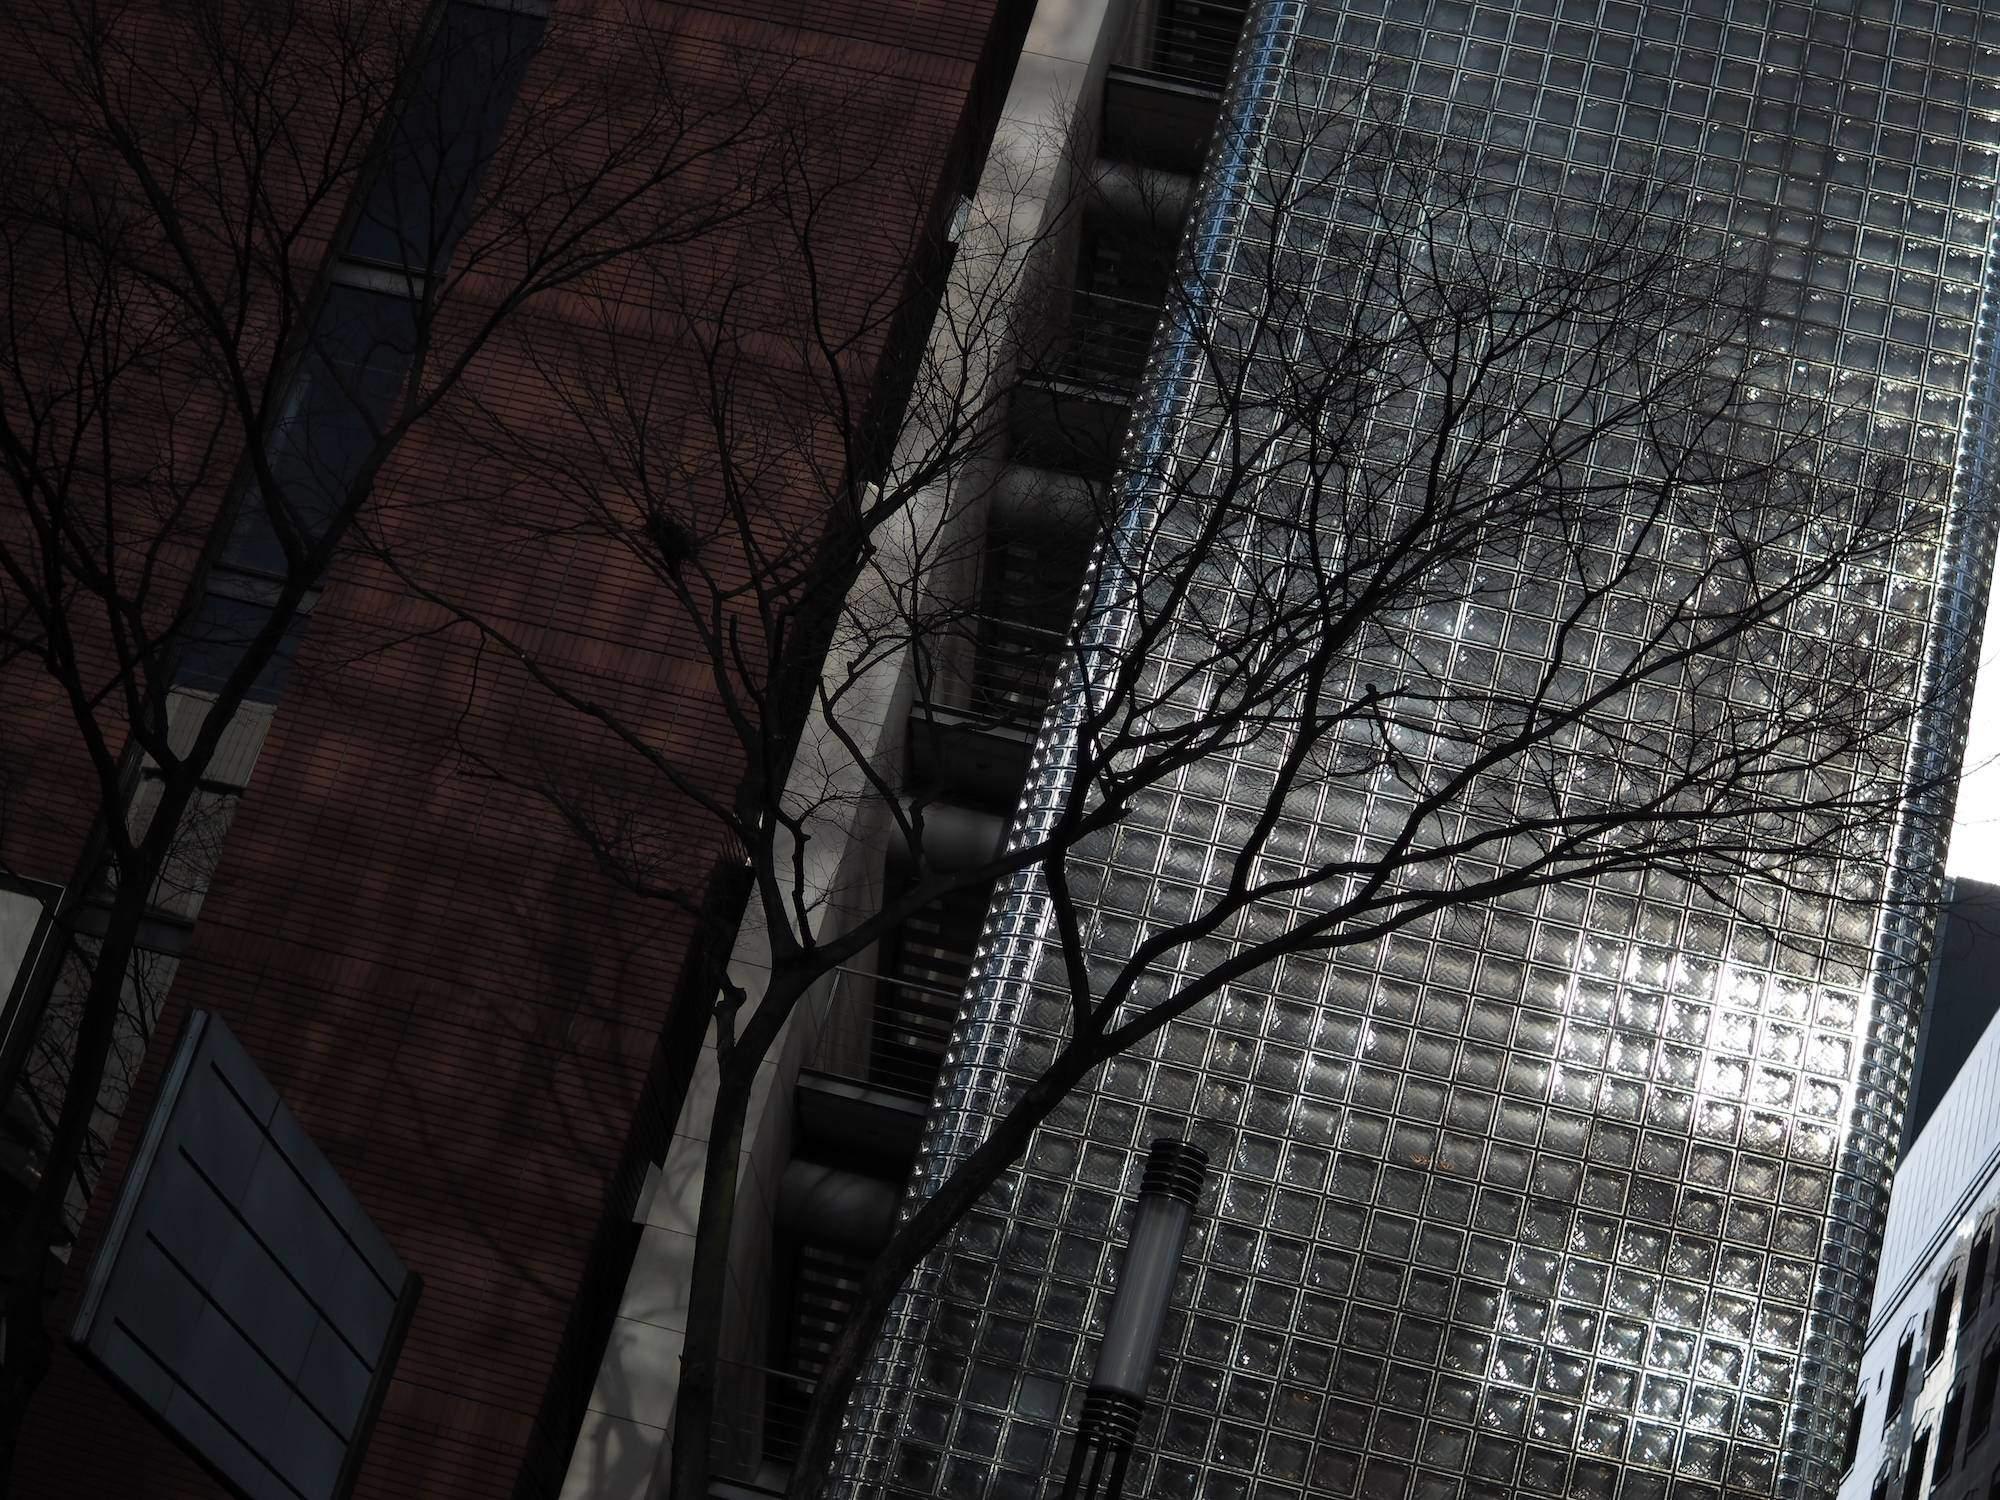 SIGMA 30mm F1.4 DC DN immagine esempio - autore - Wataru Nakamura_3.jpg original_img03_1.jpg SIGMA 30mm F1.4 DC DN immagine esempio - autore - Wataru Nakamura_2.jpg